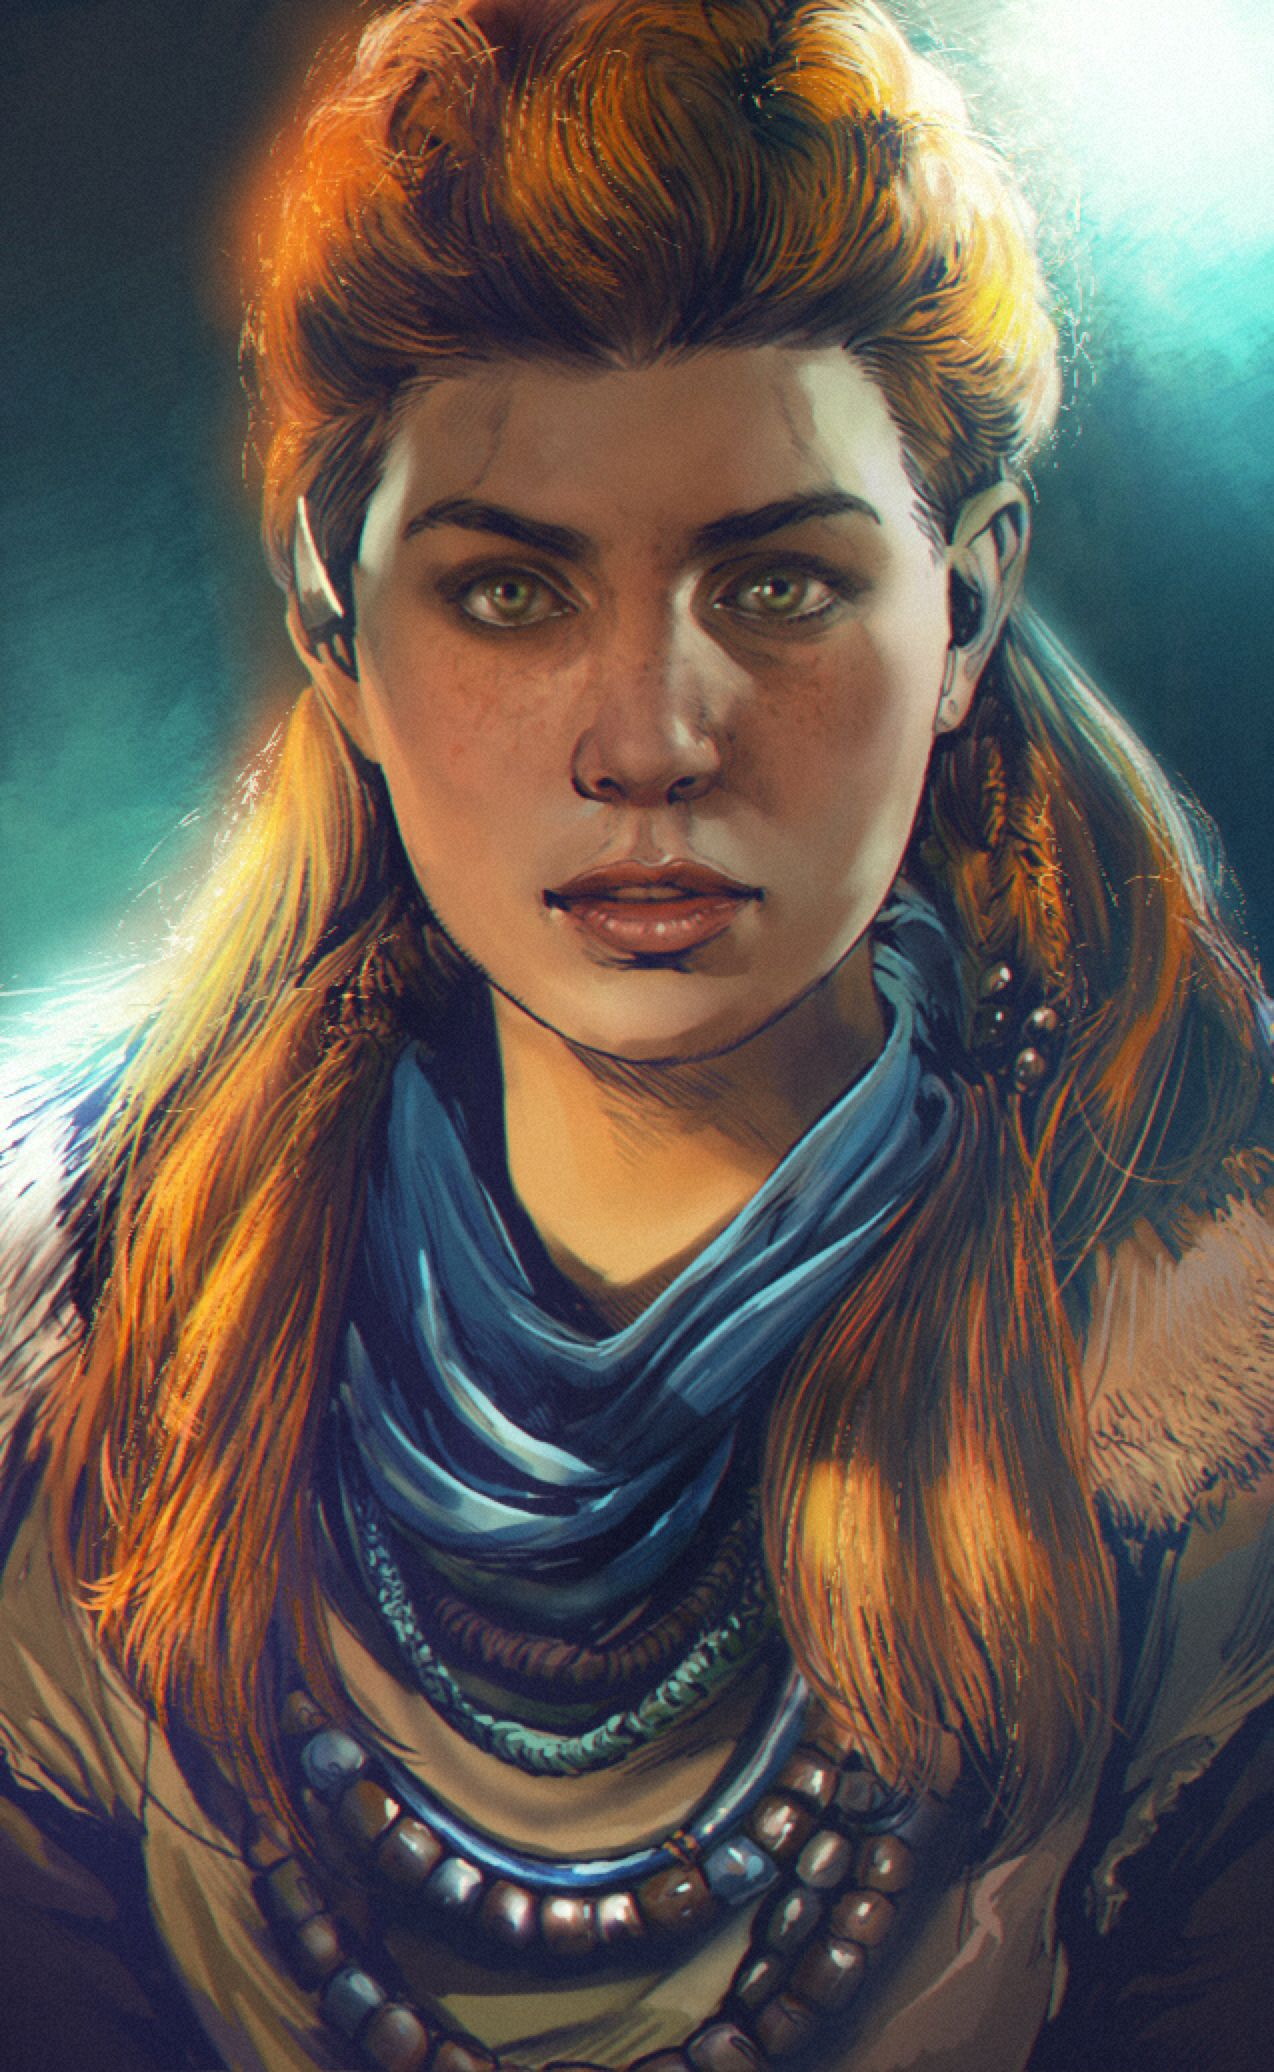 Portrait #025 by mehdic on DeviantArt